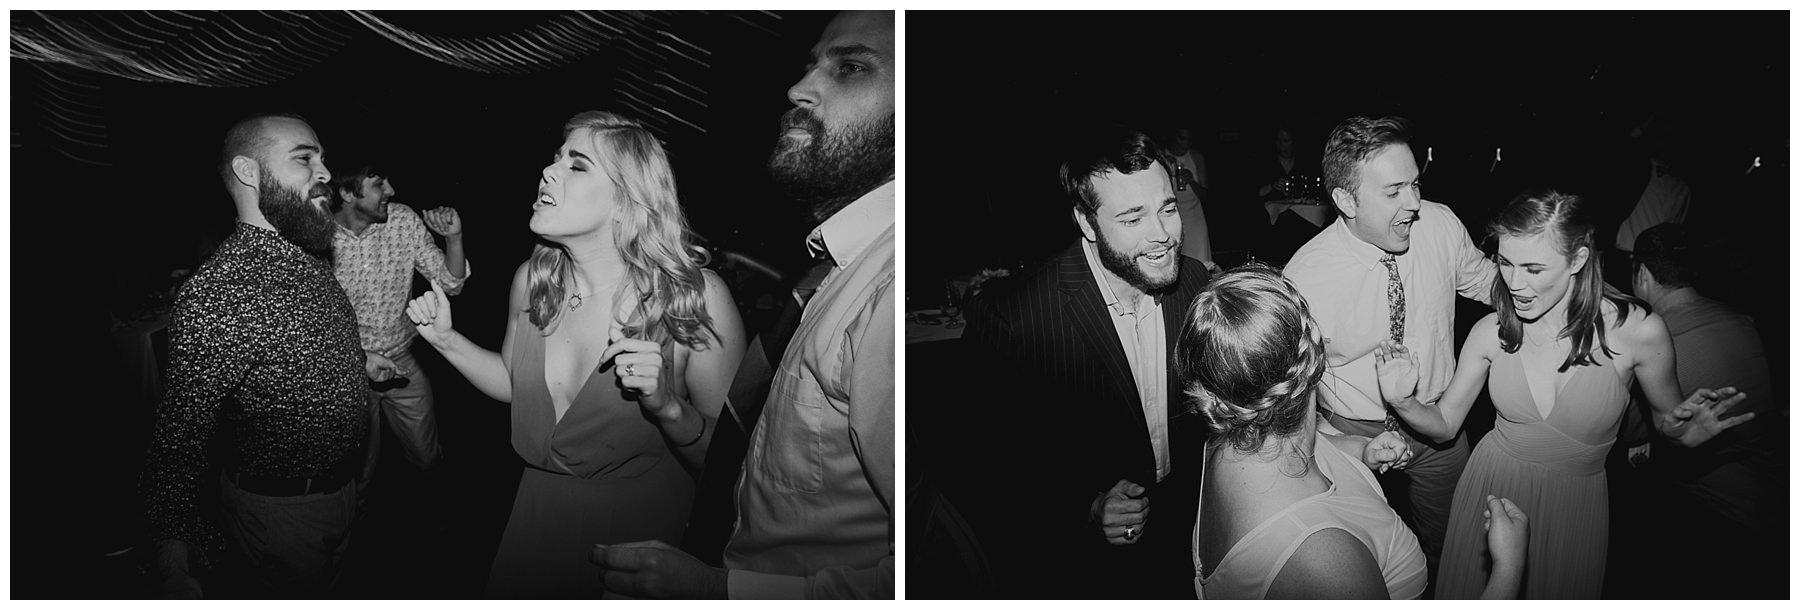 Jon and Jen New York Wedding-248.jpg